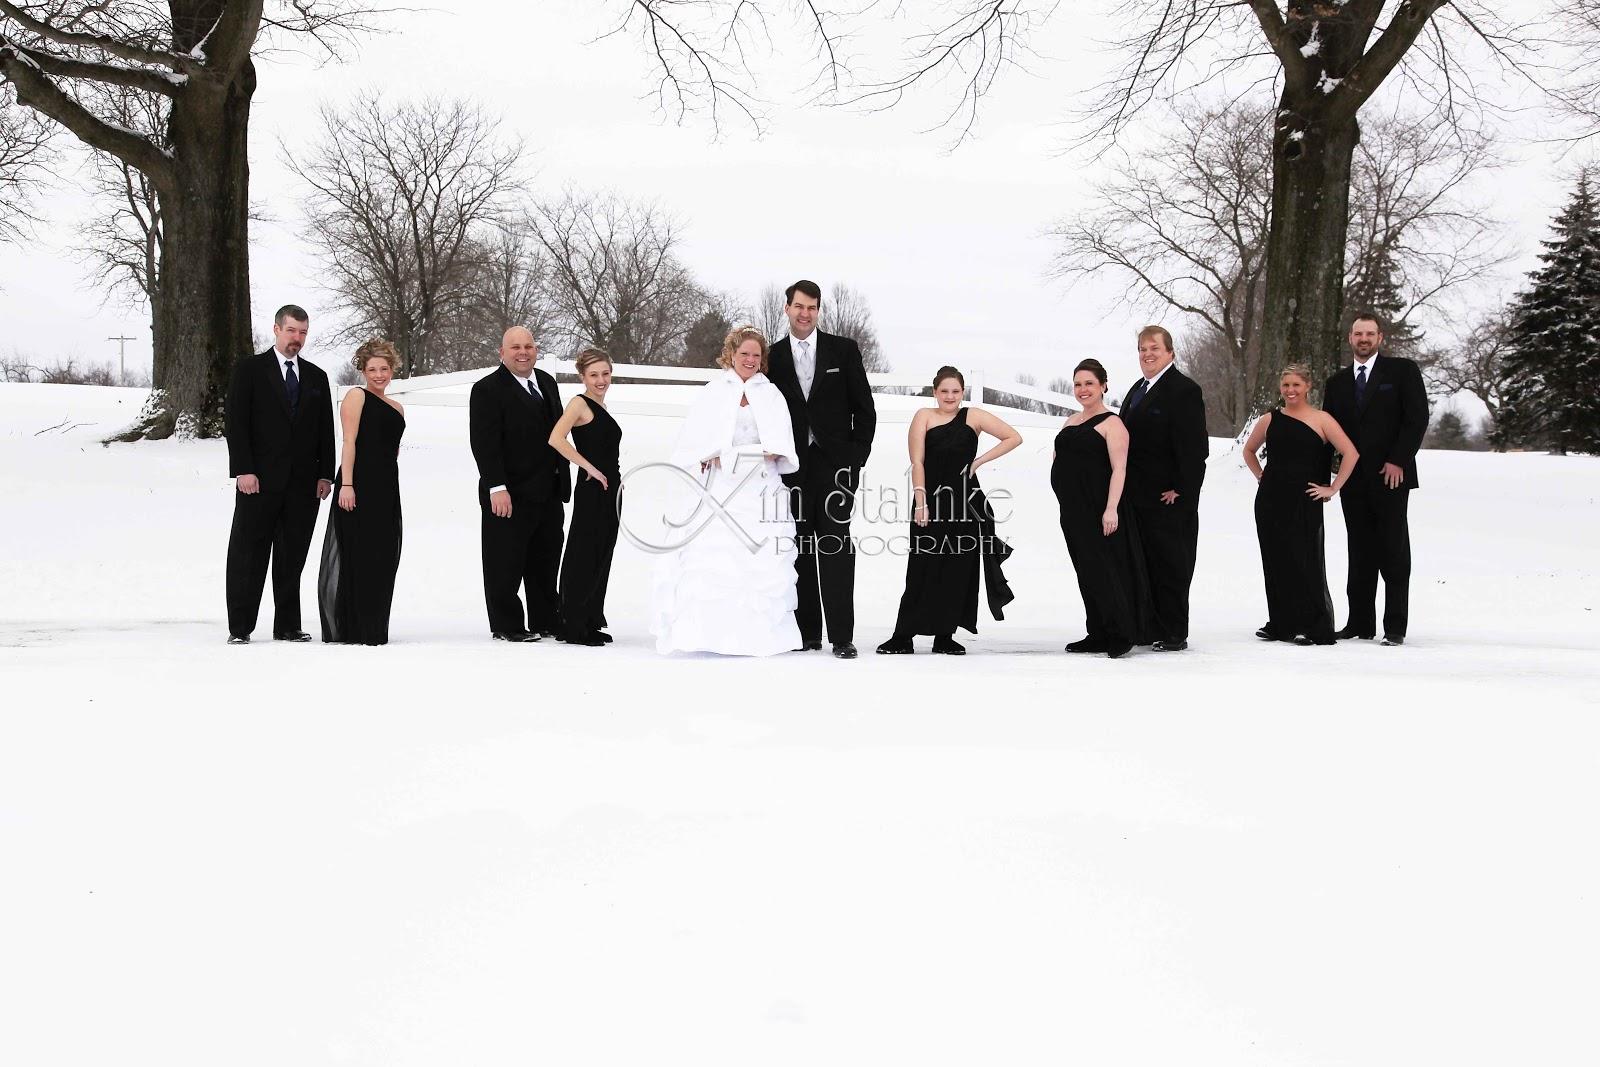 kim stahnke photography wadsworth oh wedding photographer